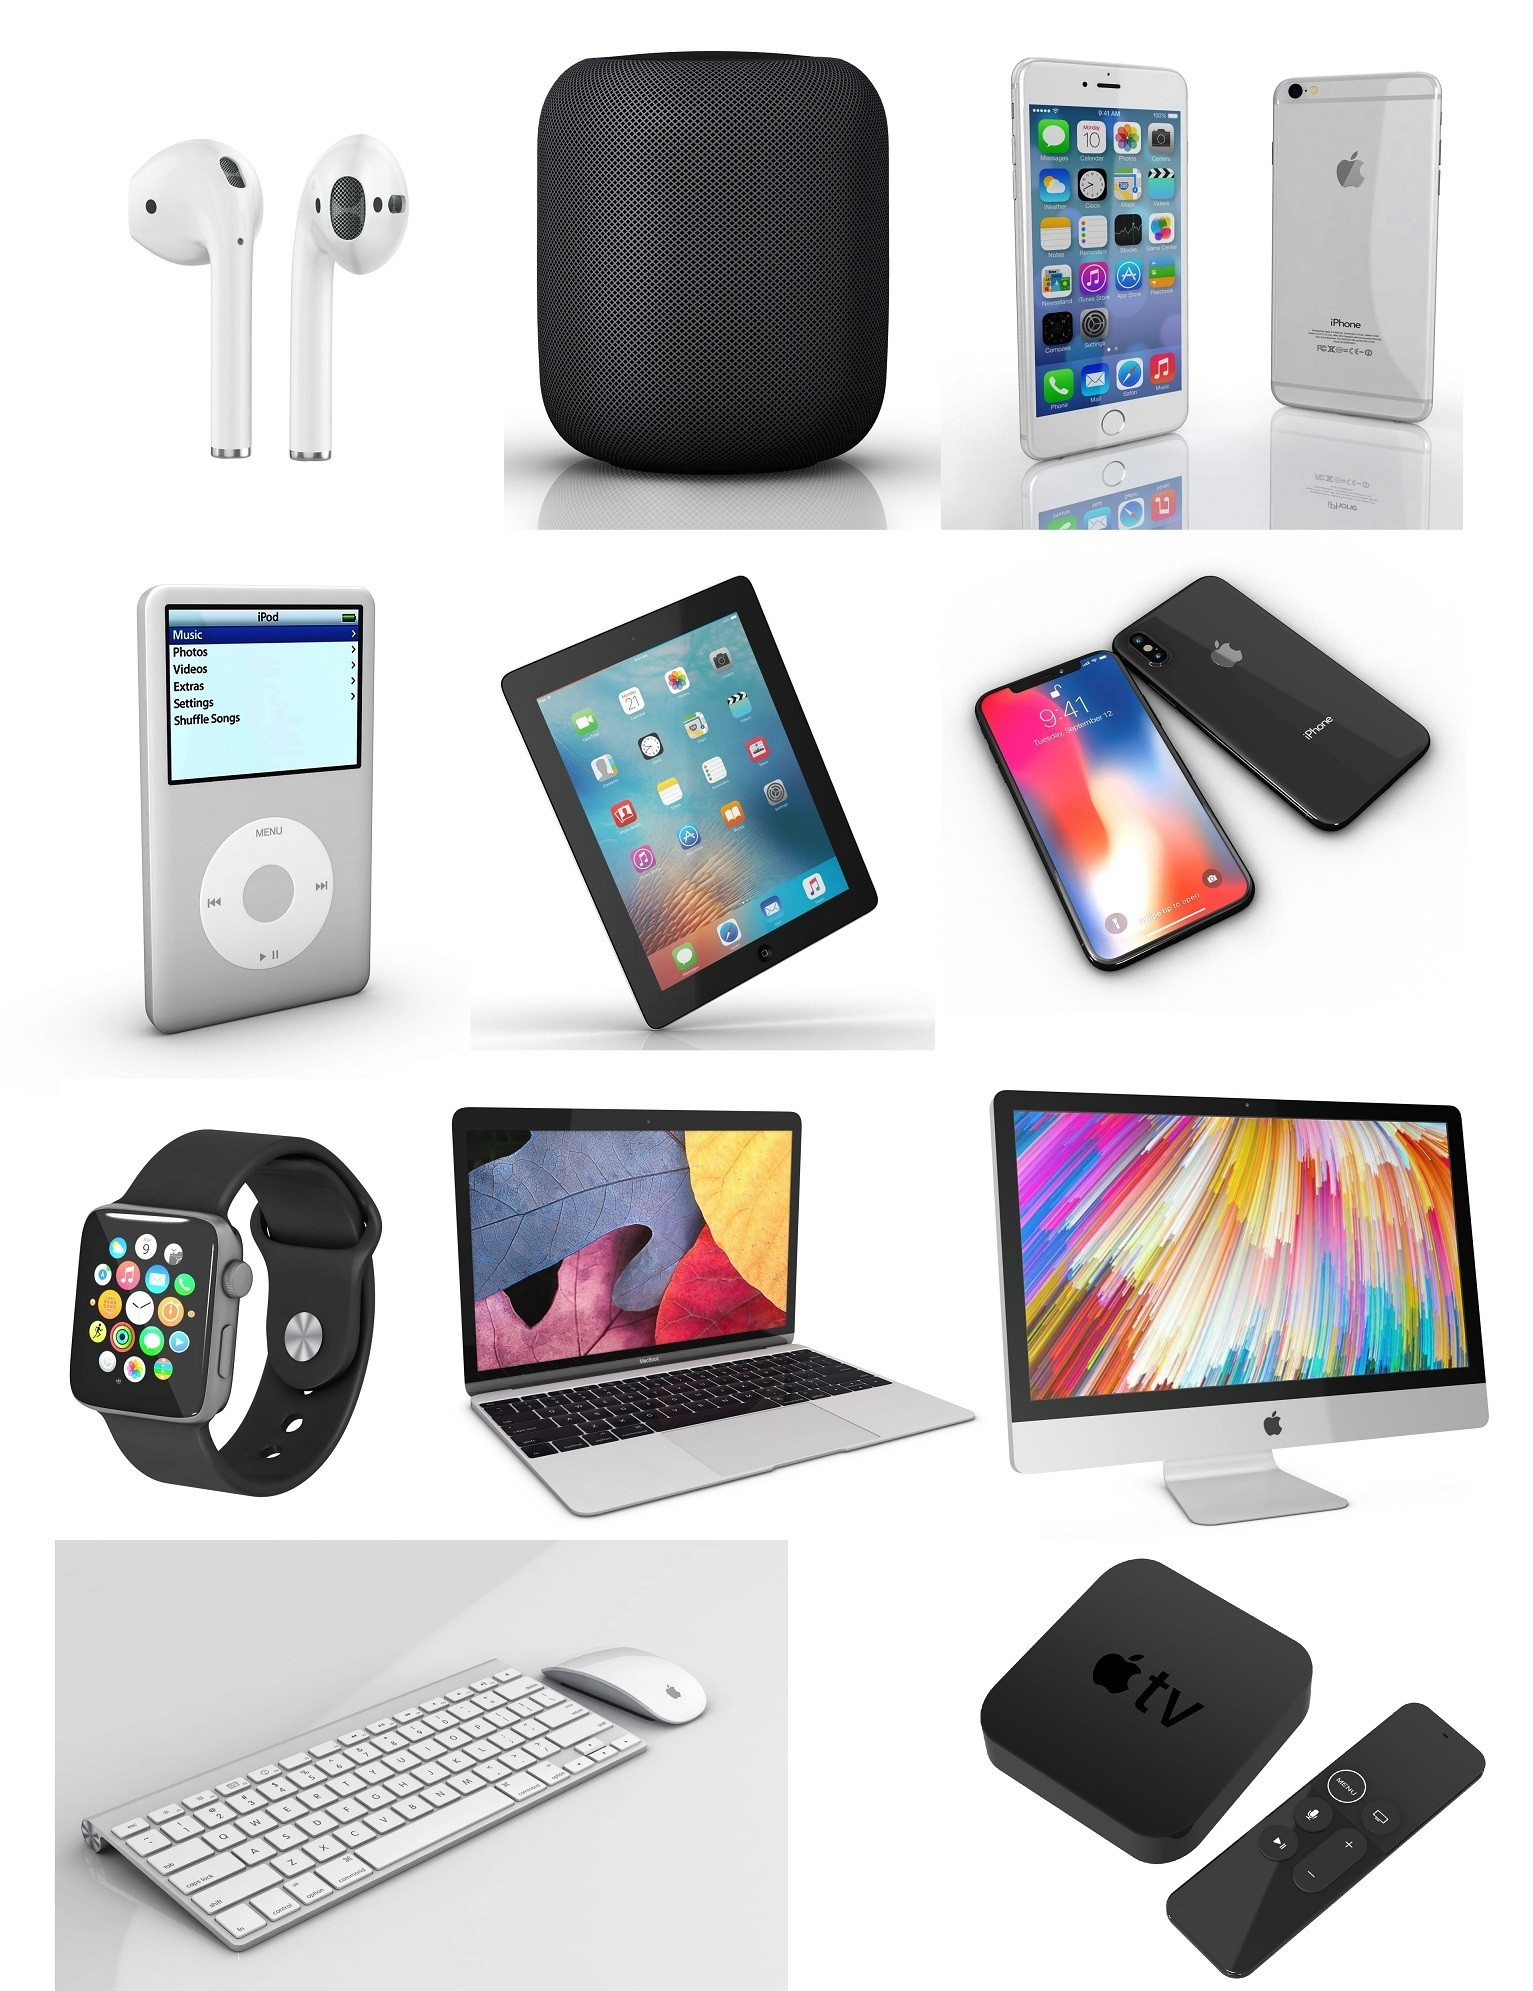 Ultimi Apple Macbook Apple iPhone Apple iPad e iWatch prezzo all'ingrosso